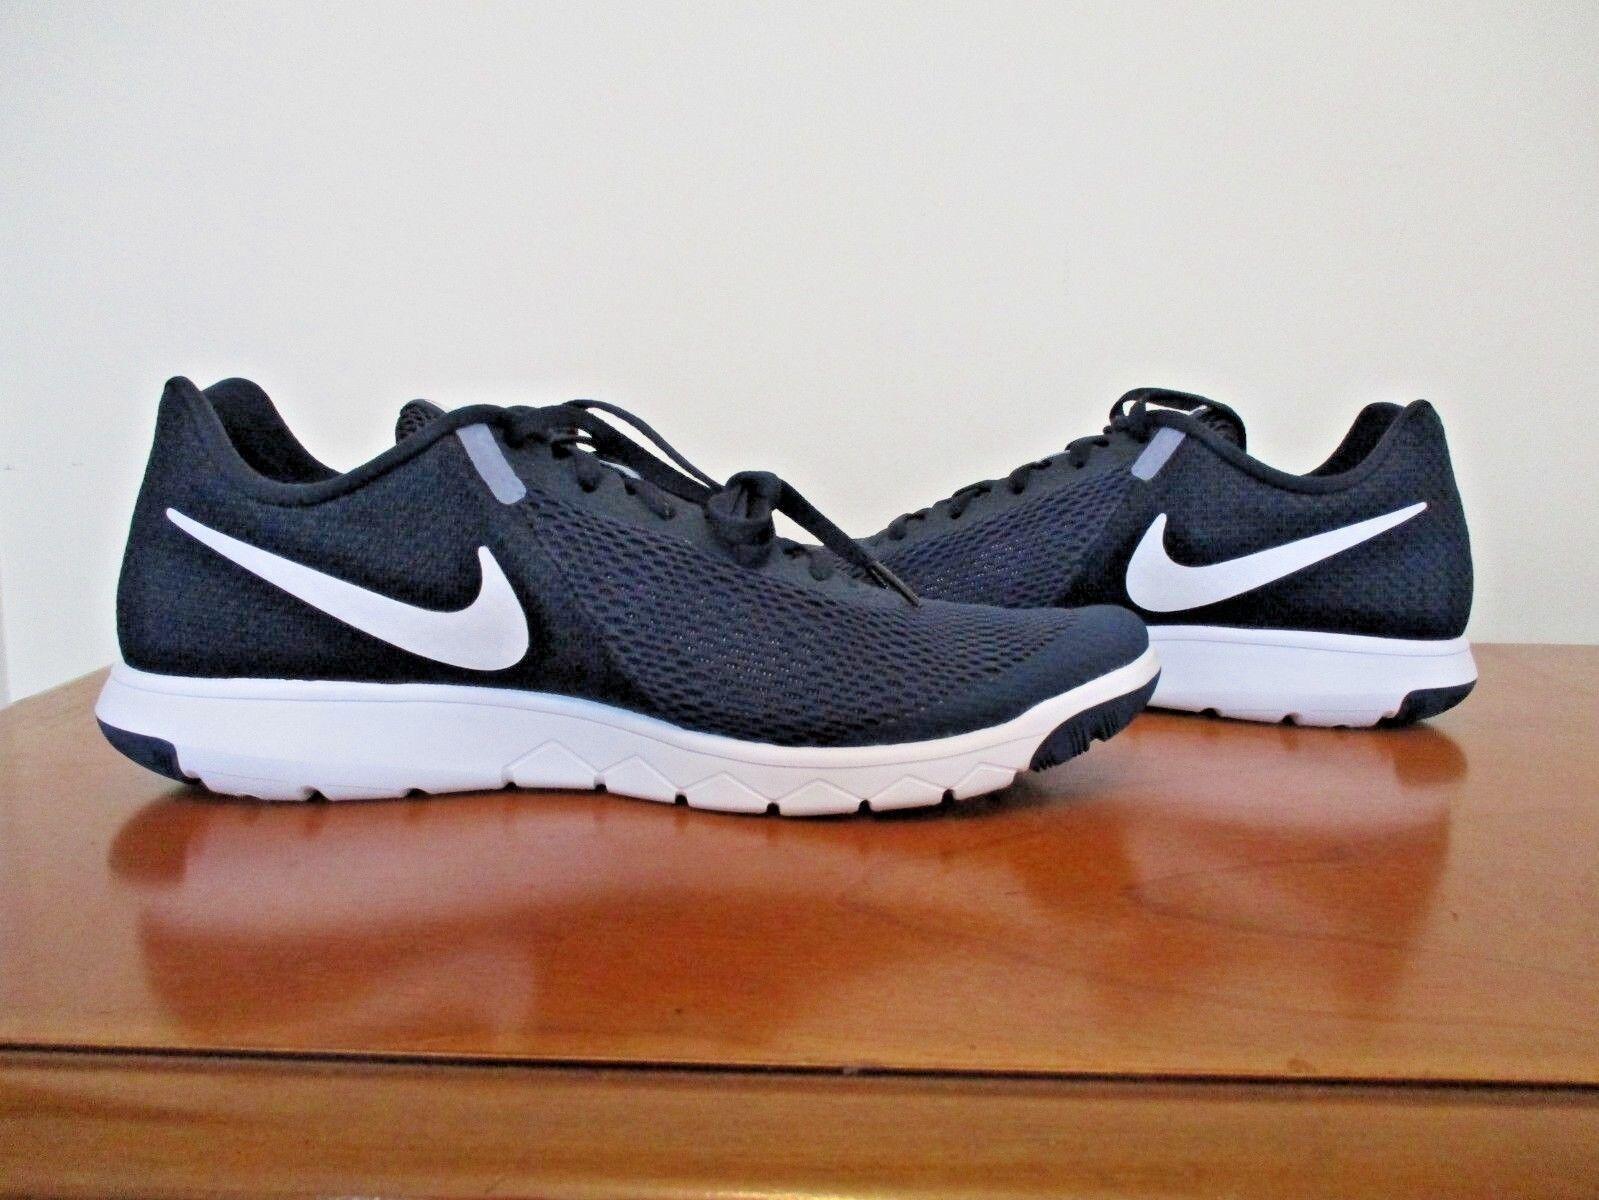 Nike new flex